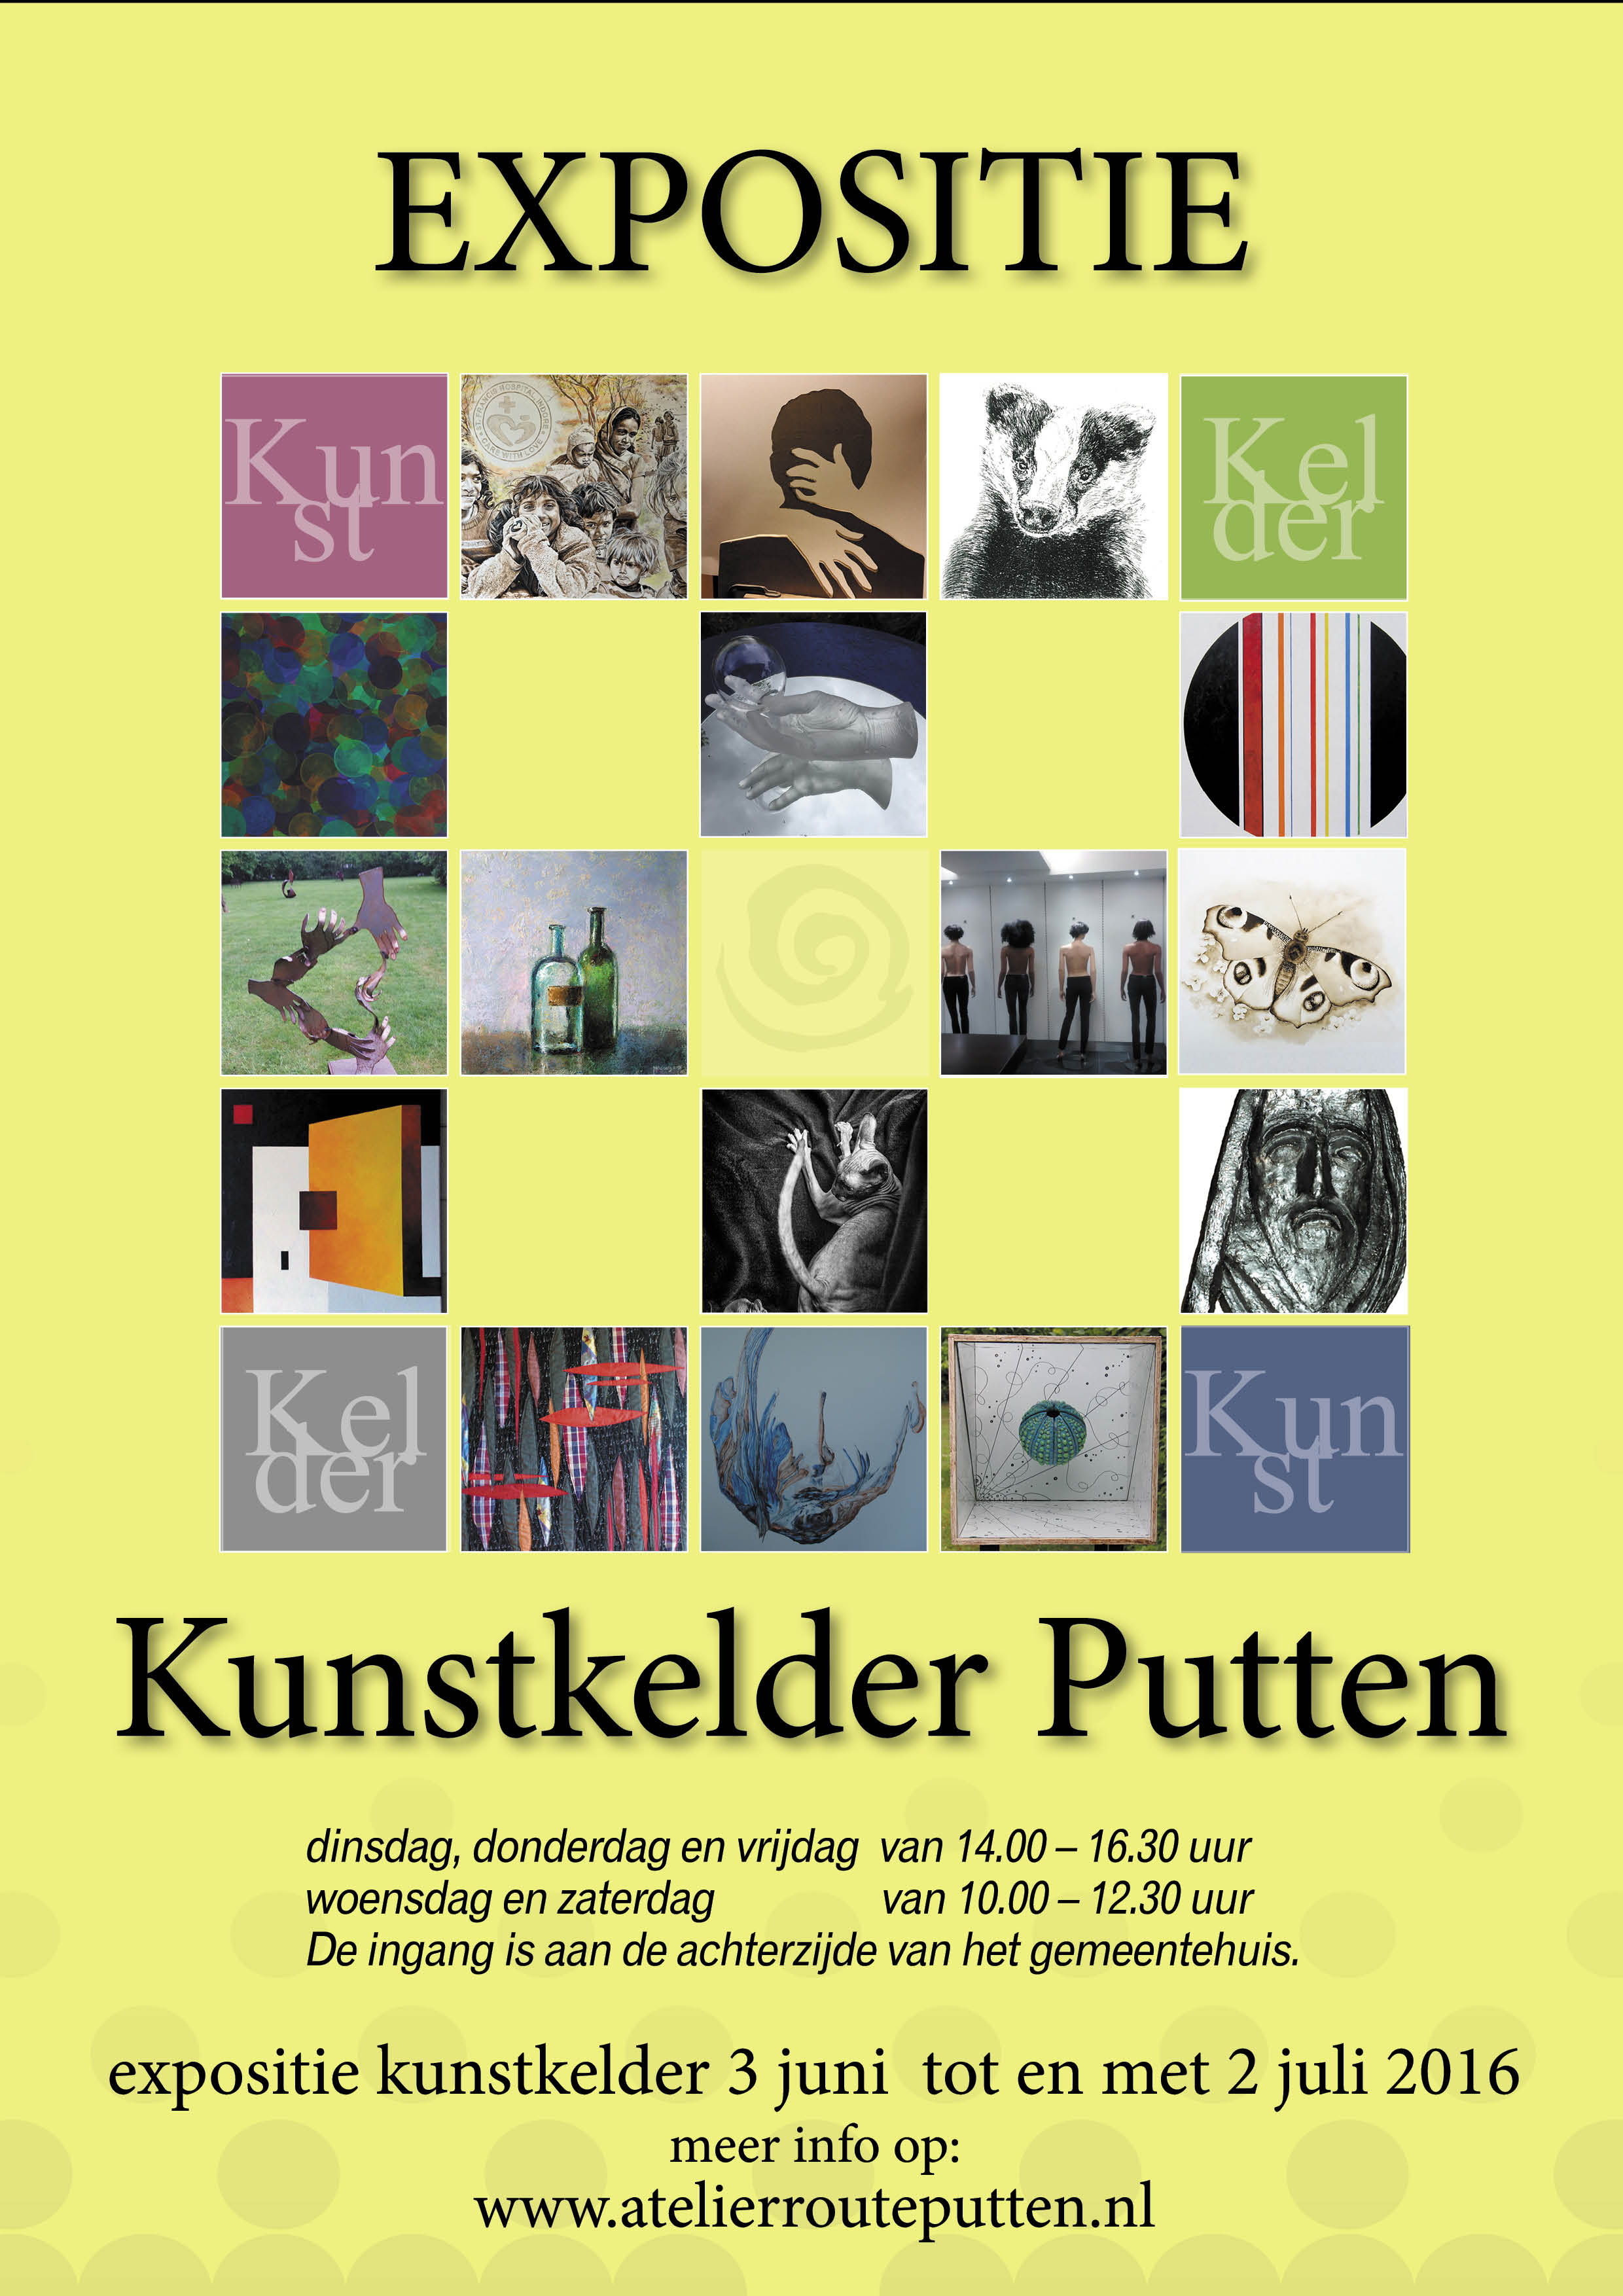 2016 kunstkelder poster A4-2-yellow-bkgrnd